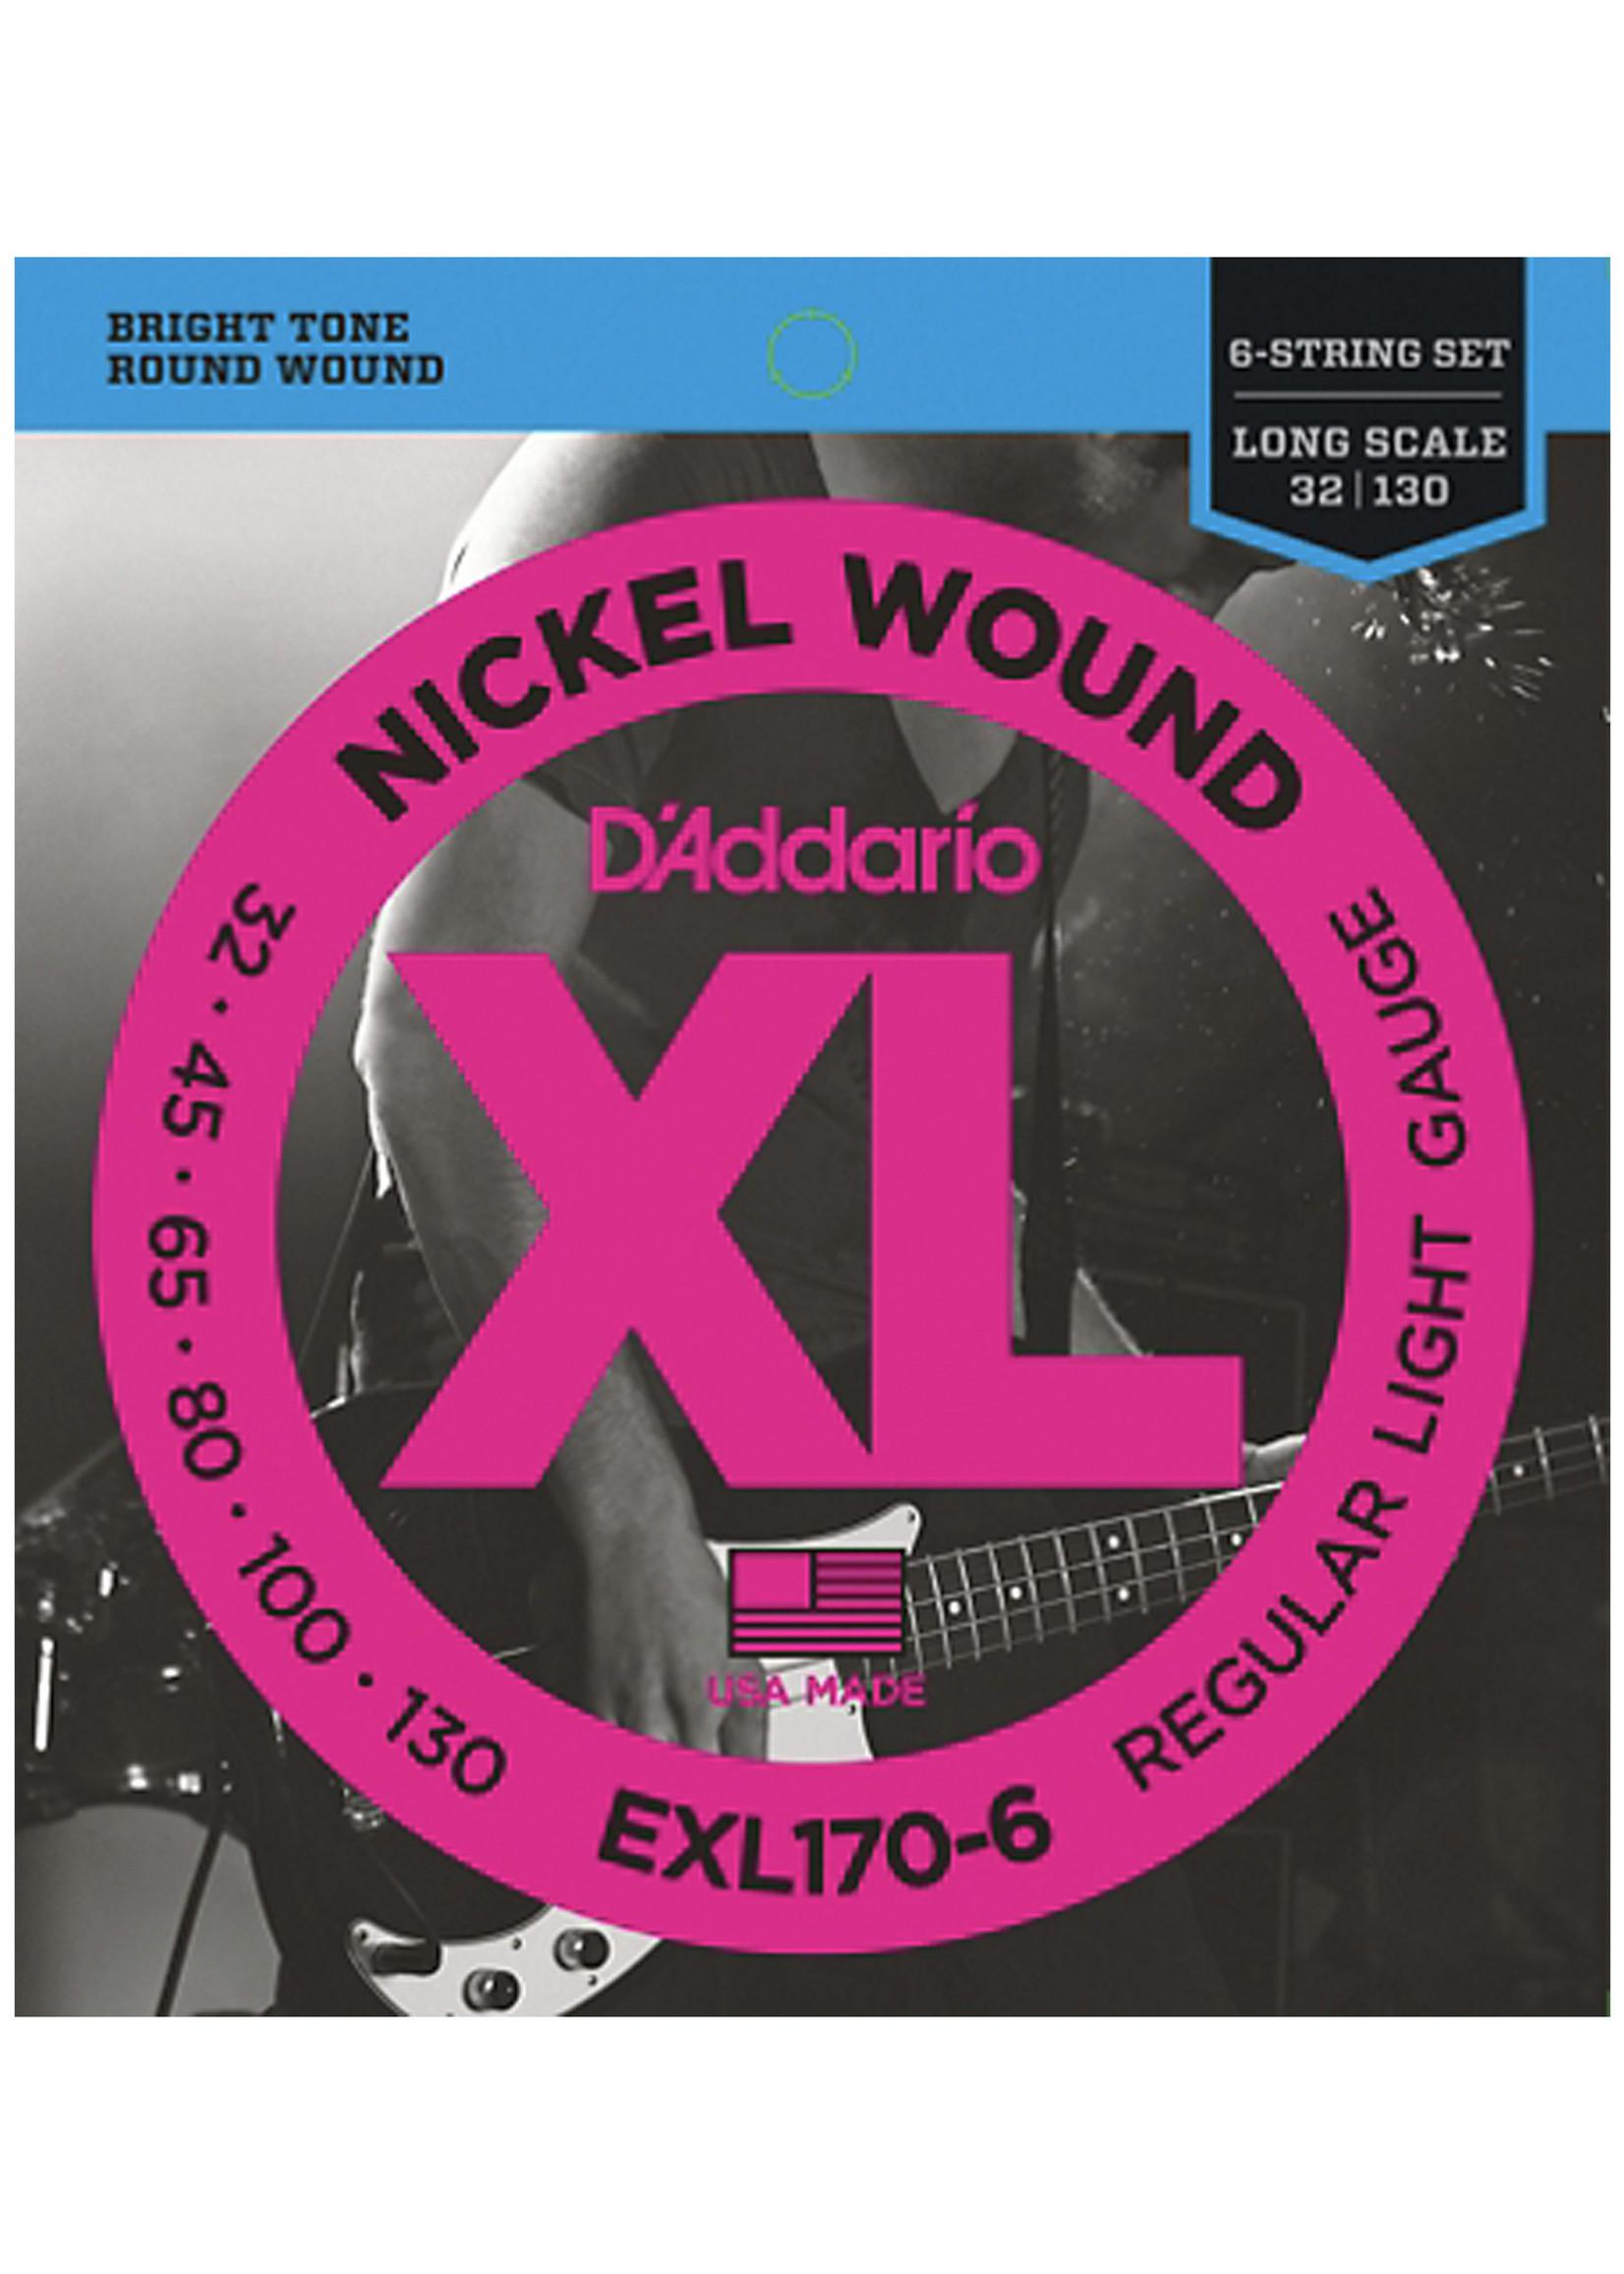 DAddario Fretted D'Addario EXL170-6, 32-130